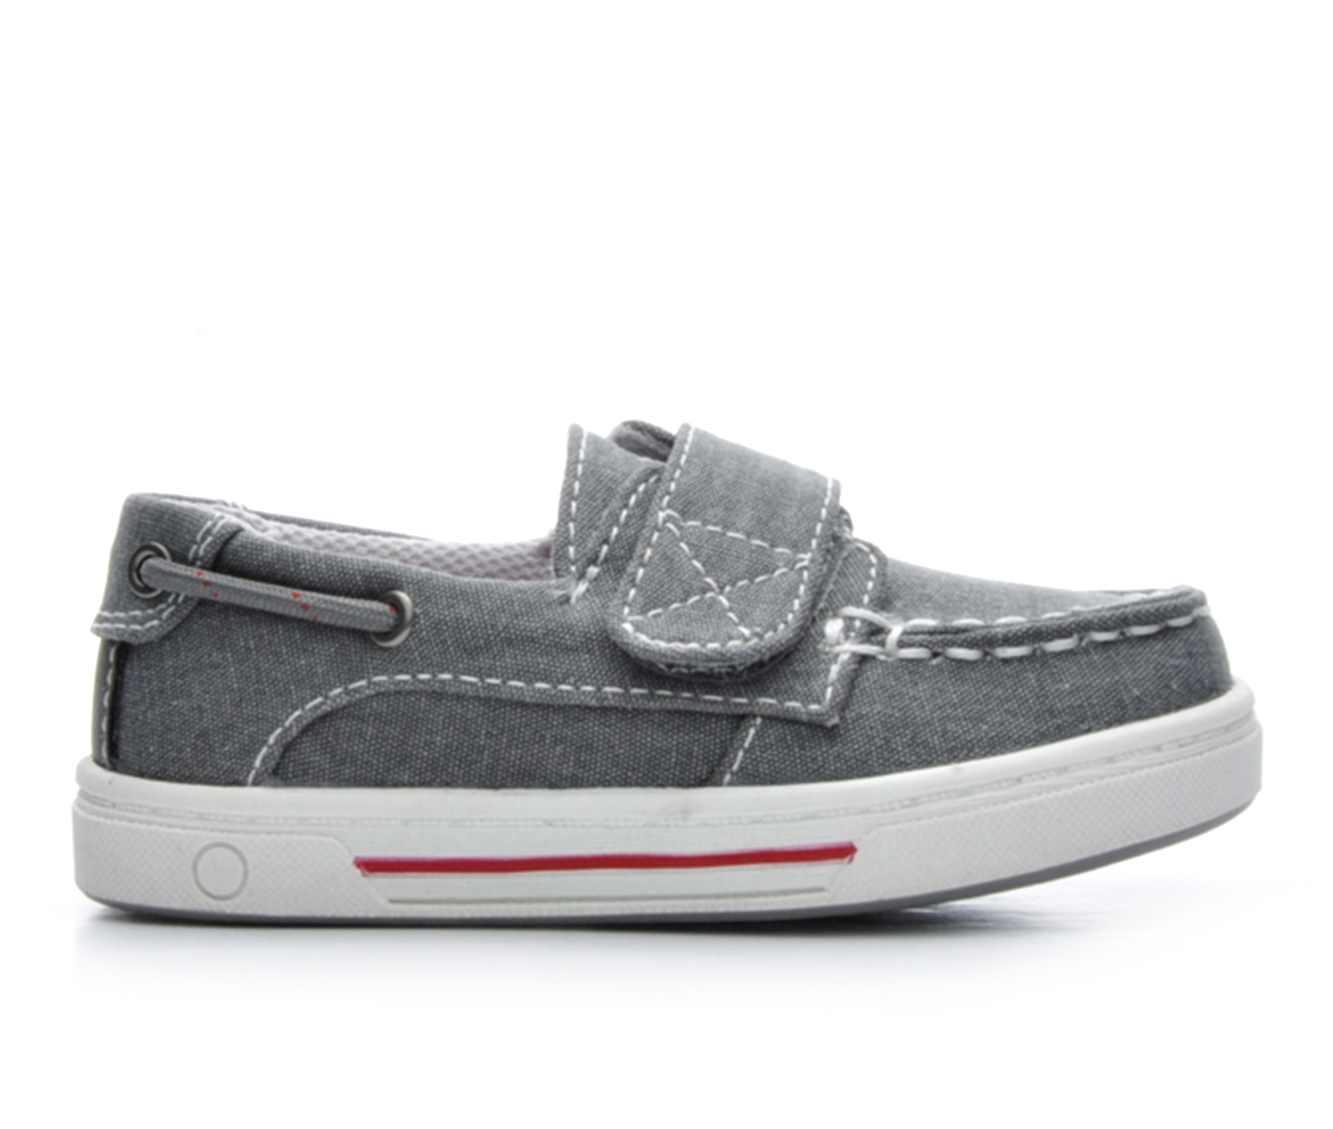 Boys' Anchors Edge Bay Infant Sammy Boat Shoes (Grey)